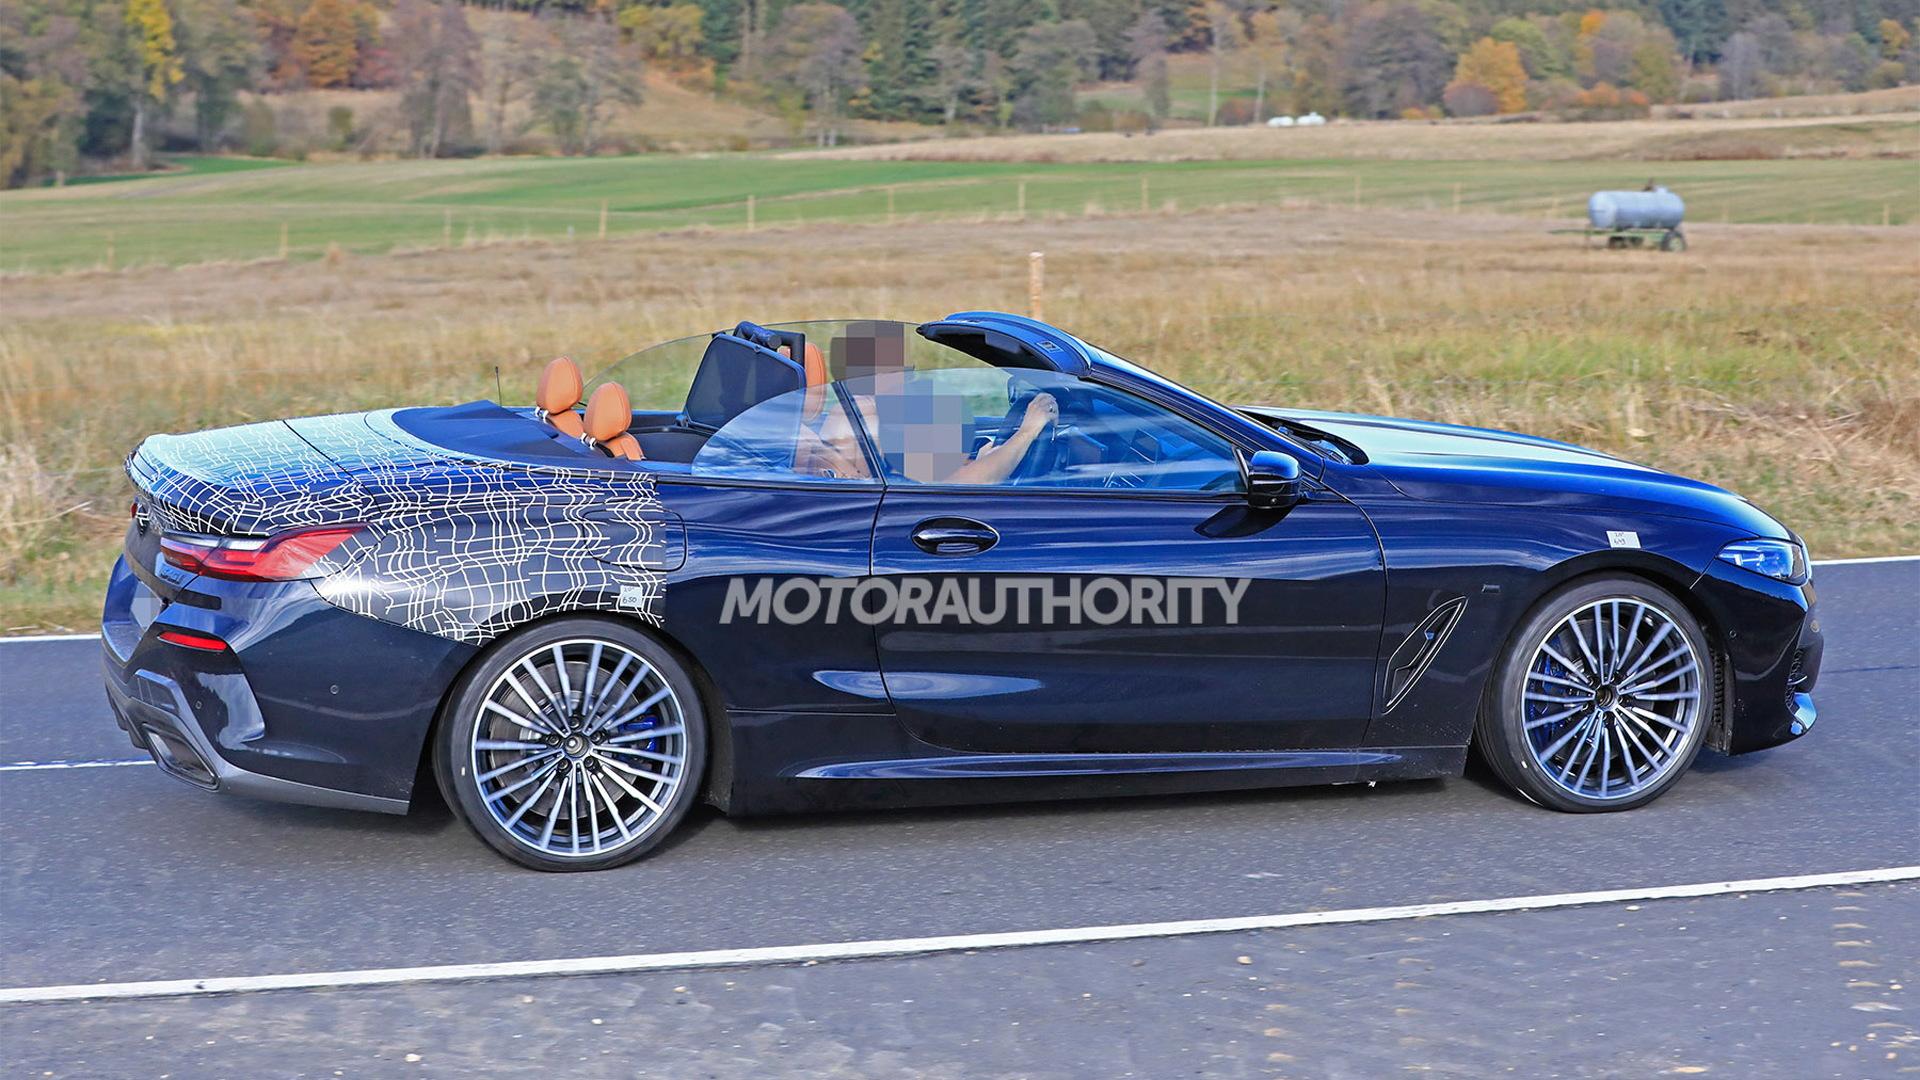 2019 BMW 8-Series Convertible spy shots - Image via S. Baldauf/SB-Medien